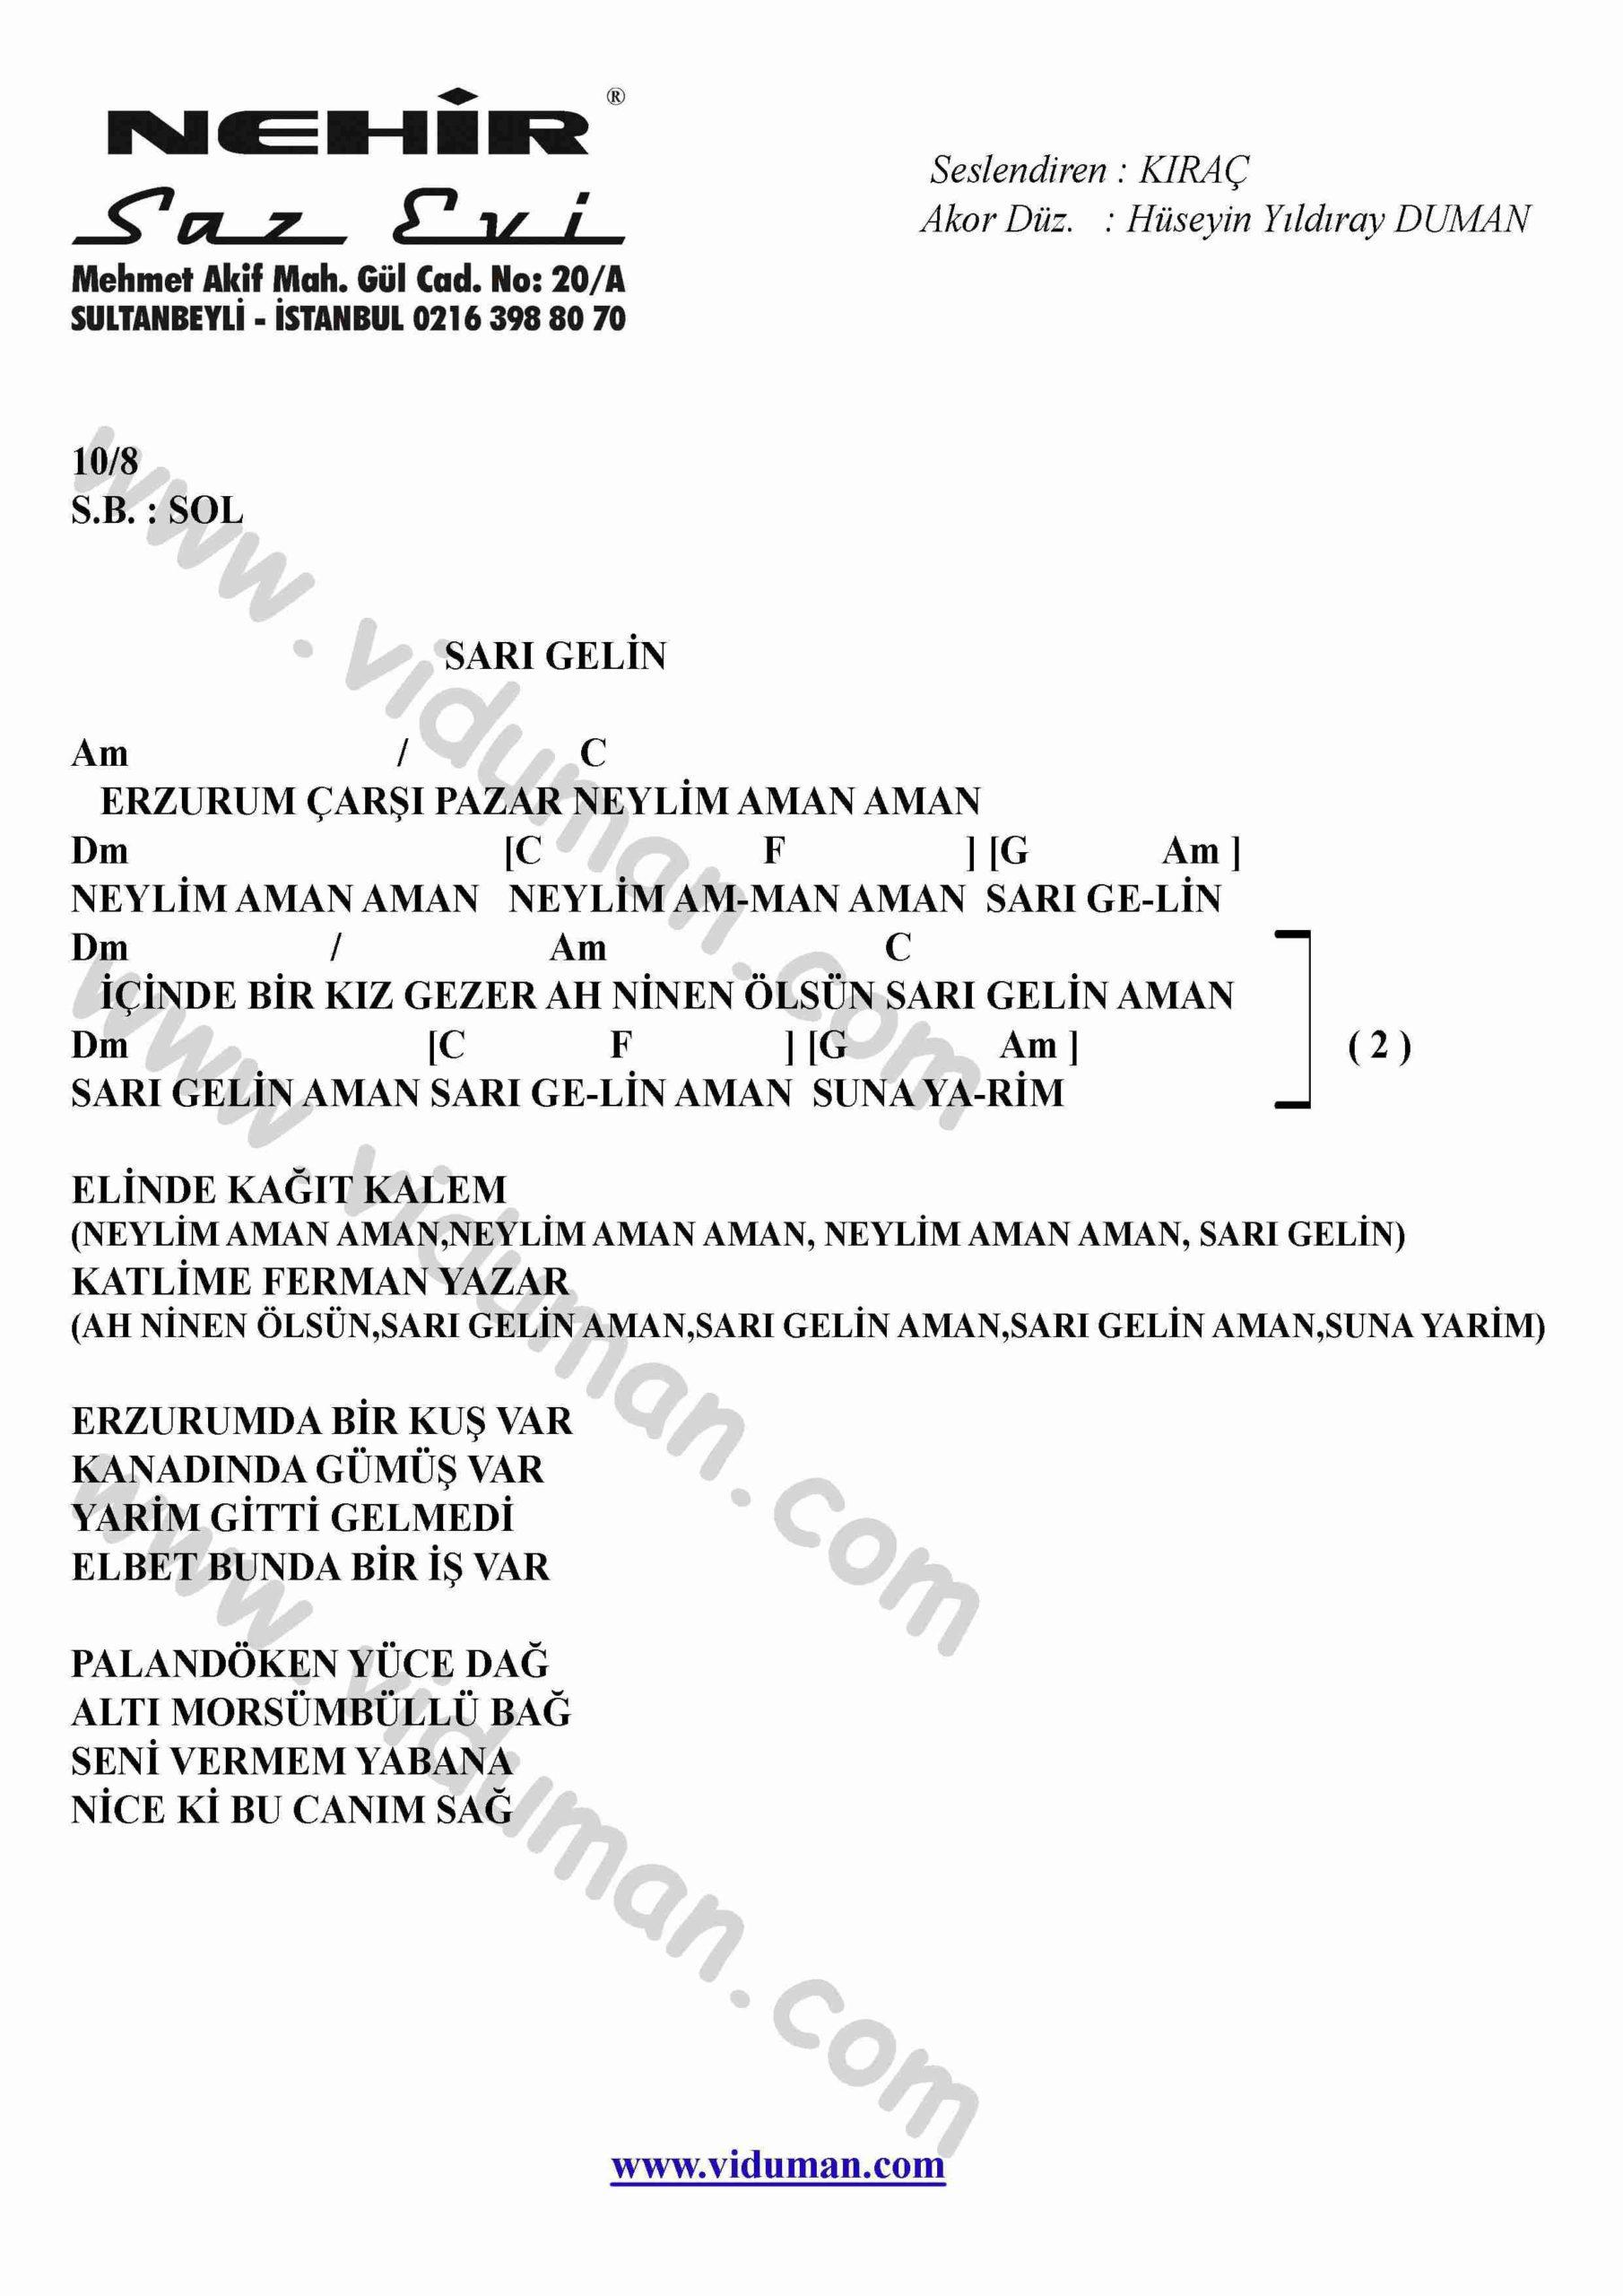 Sari Gelin-Gitar-Ritim-Akorlari